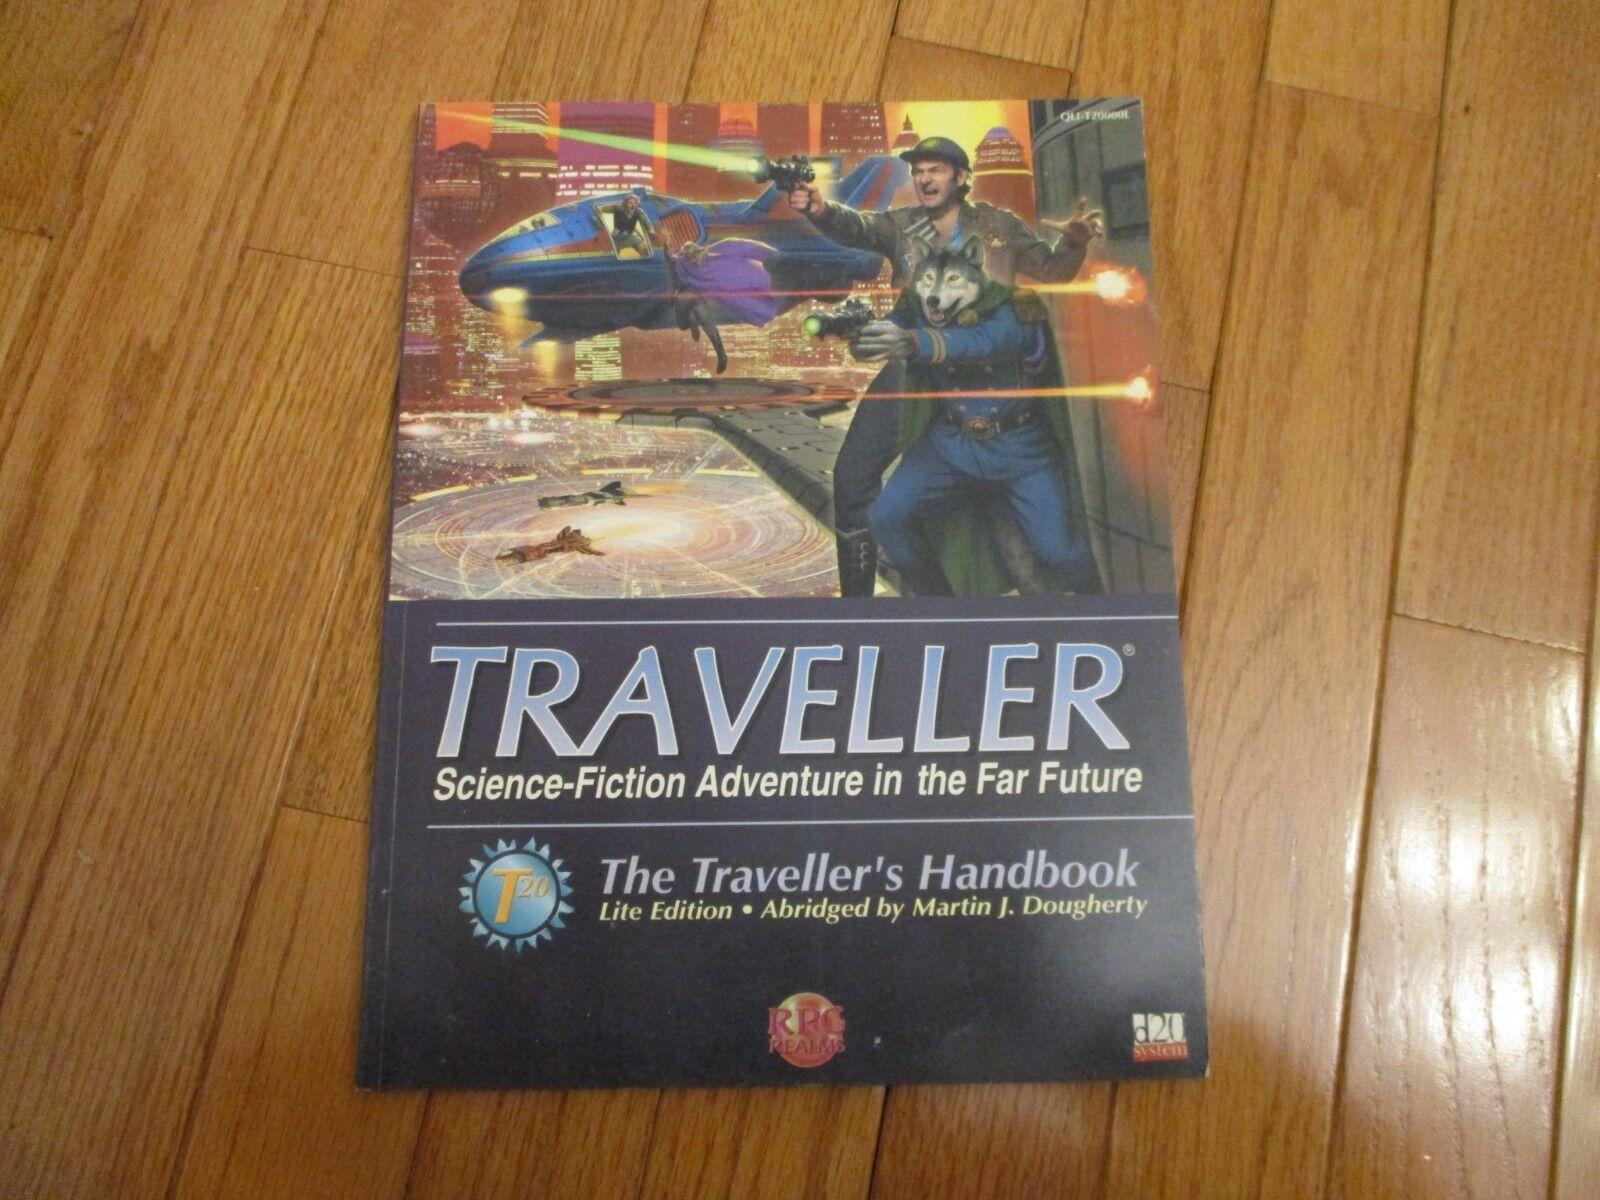 Traveller RPG Far Future The Traveller's Handbook Lite Edition